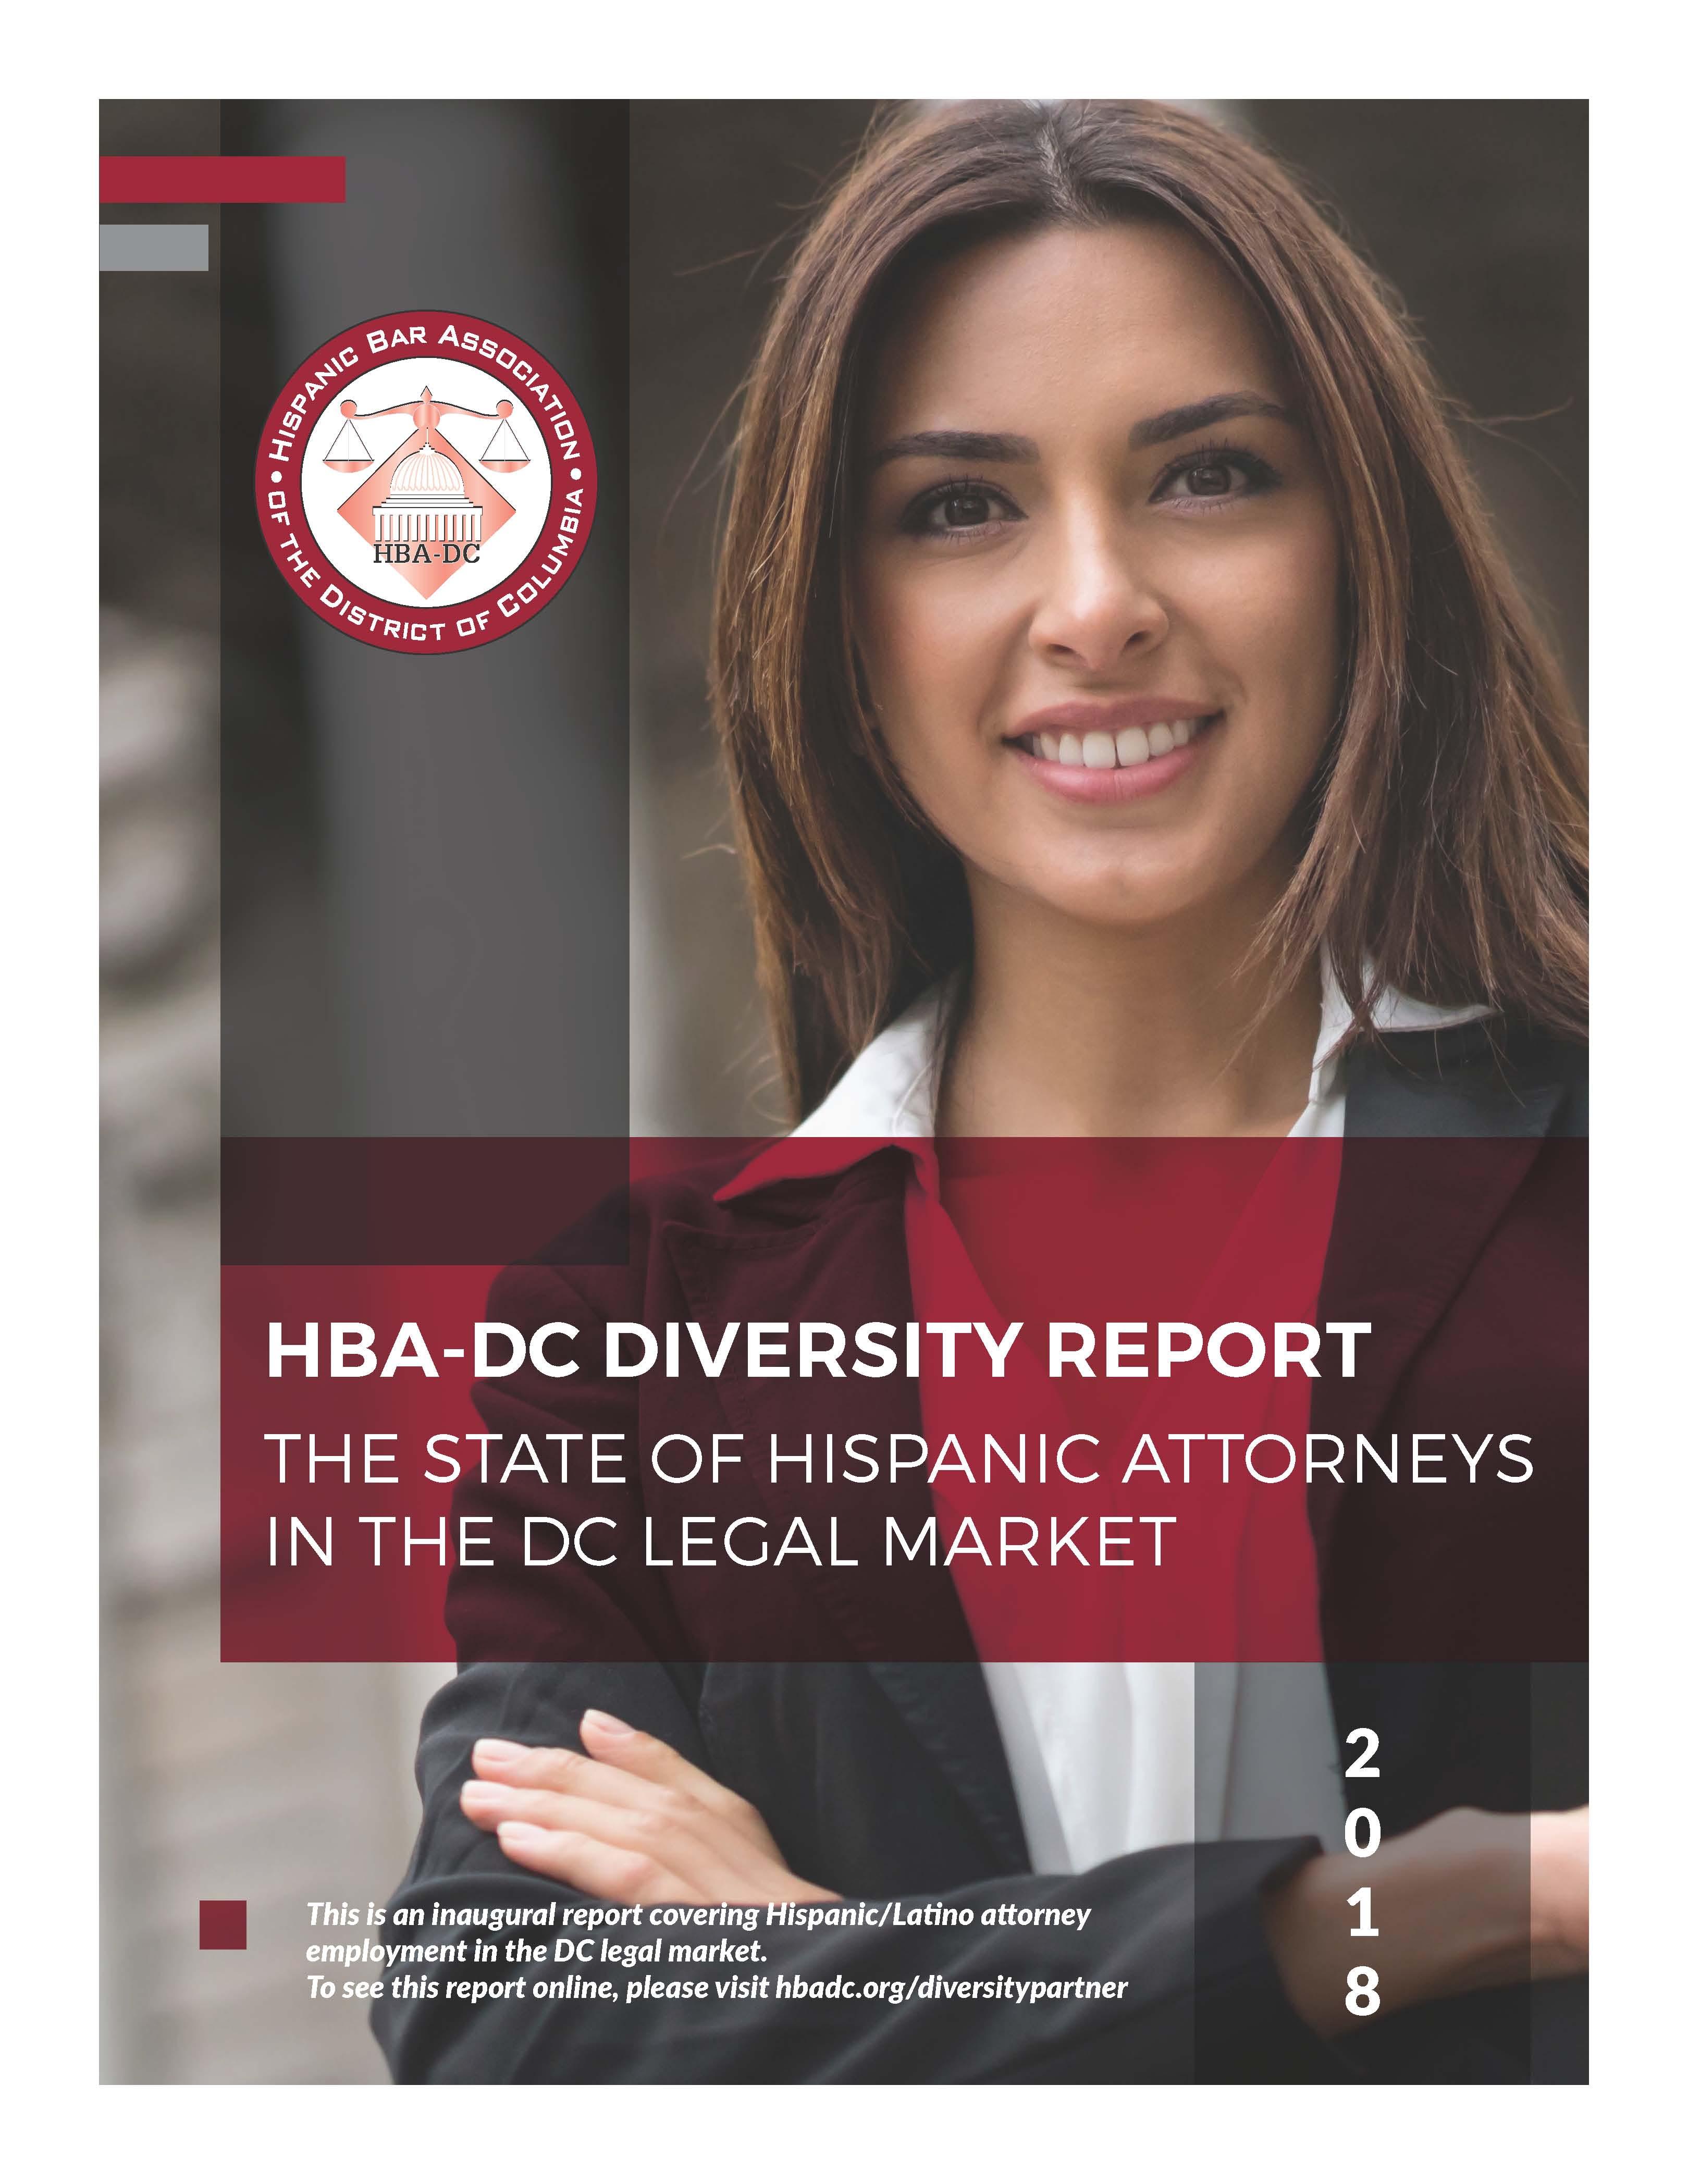 HBA-DC 2018 Diversity Report